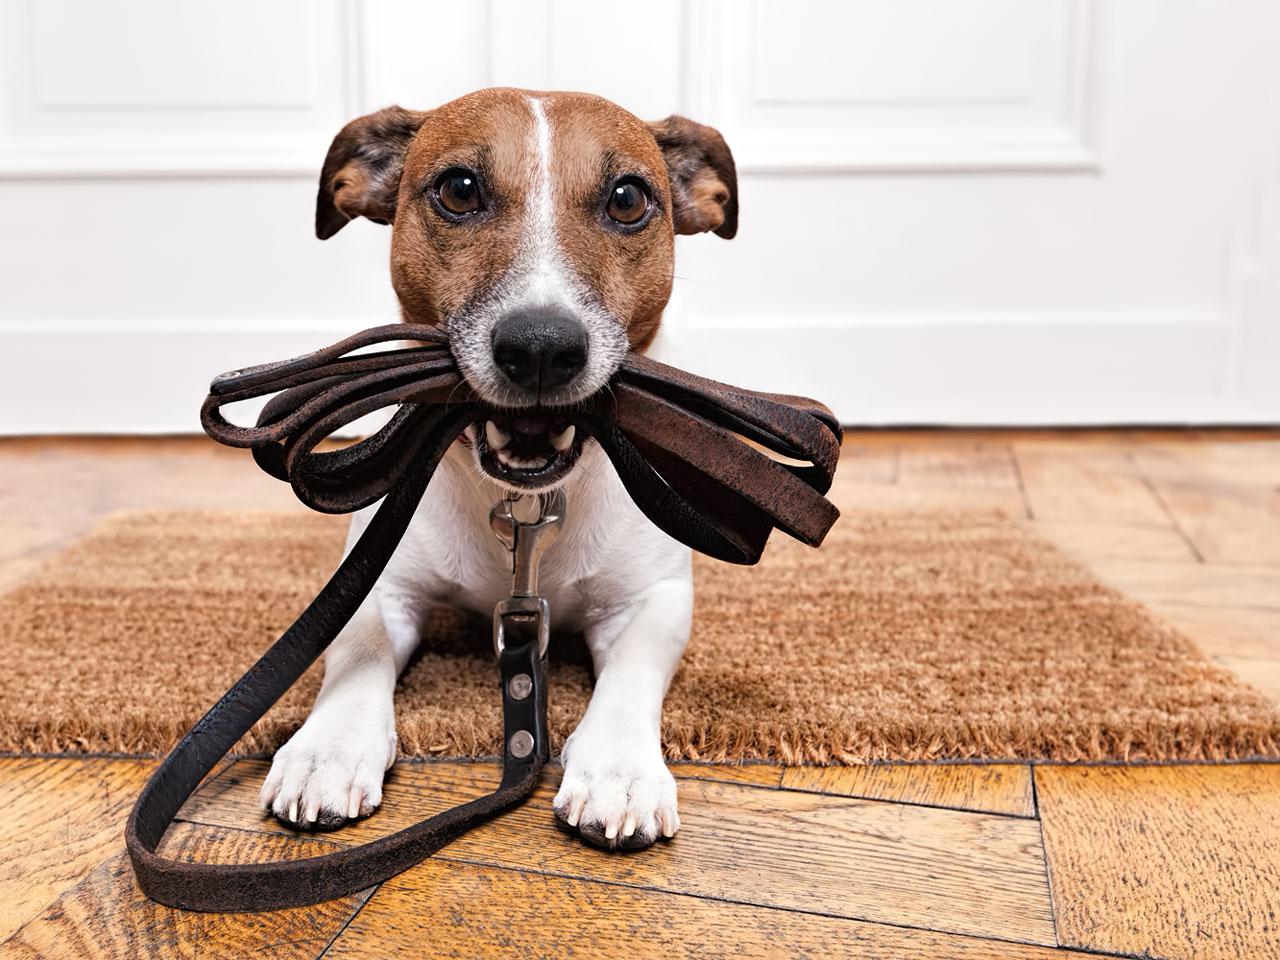 Jack Russell <a href='https://www.tieranzeigen.at/hunde/terrier/' title='Terrier kaufen & verkaufen' class='link_xl'>Terrier</a> mit Hundeleine im Maul